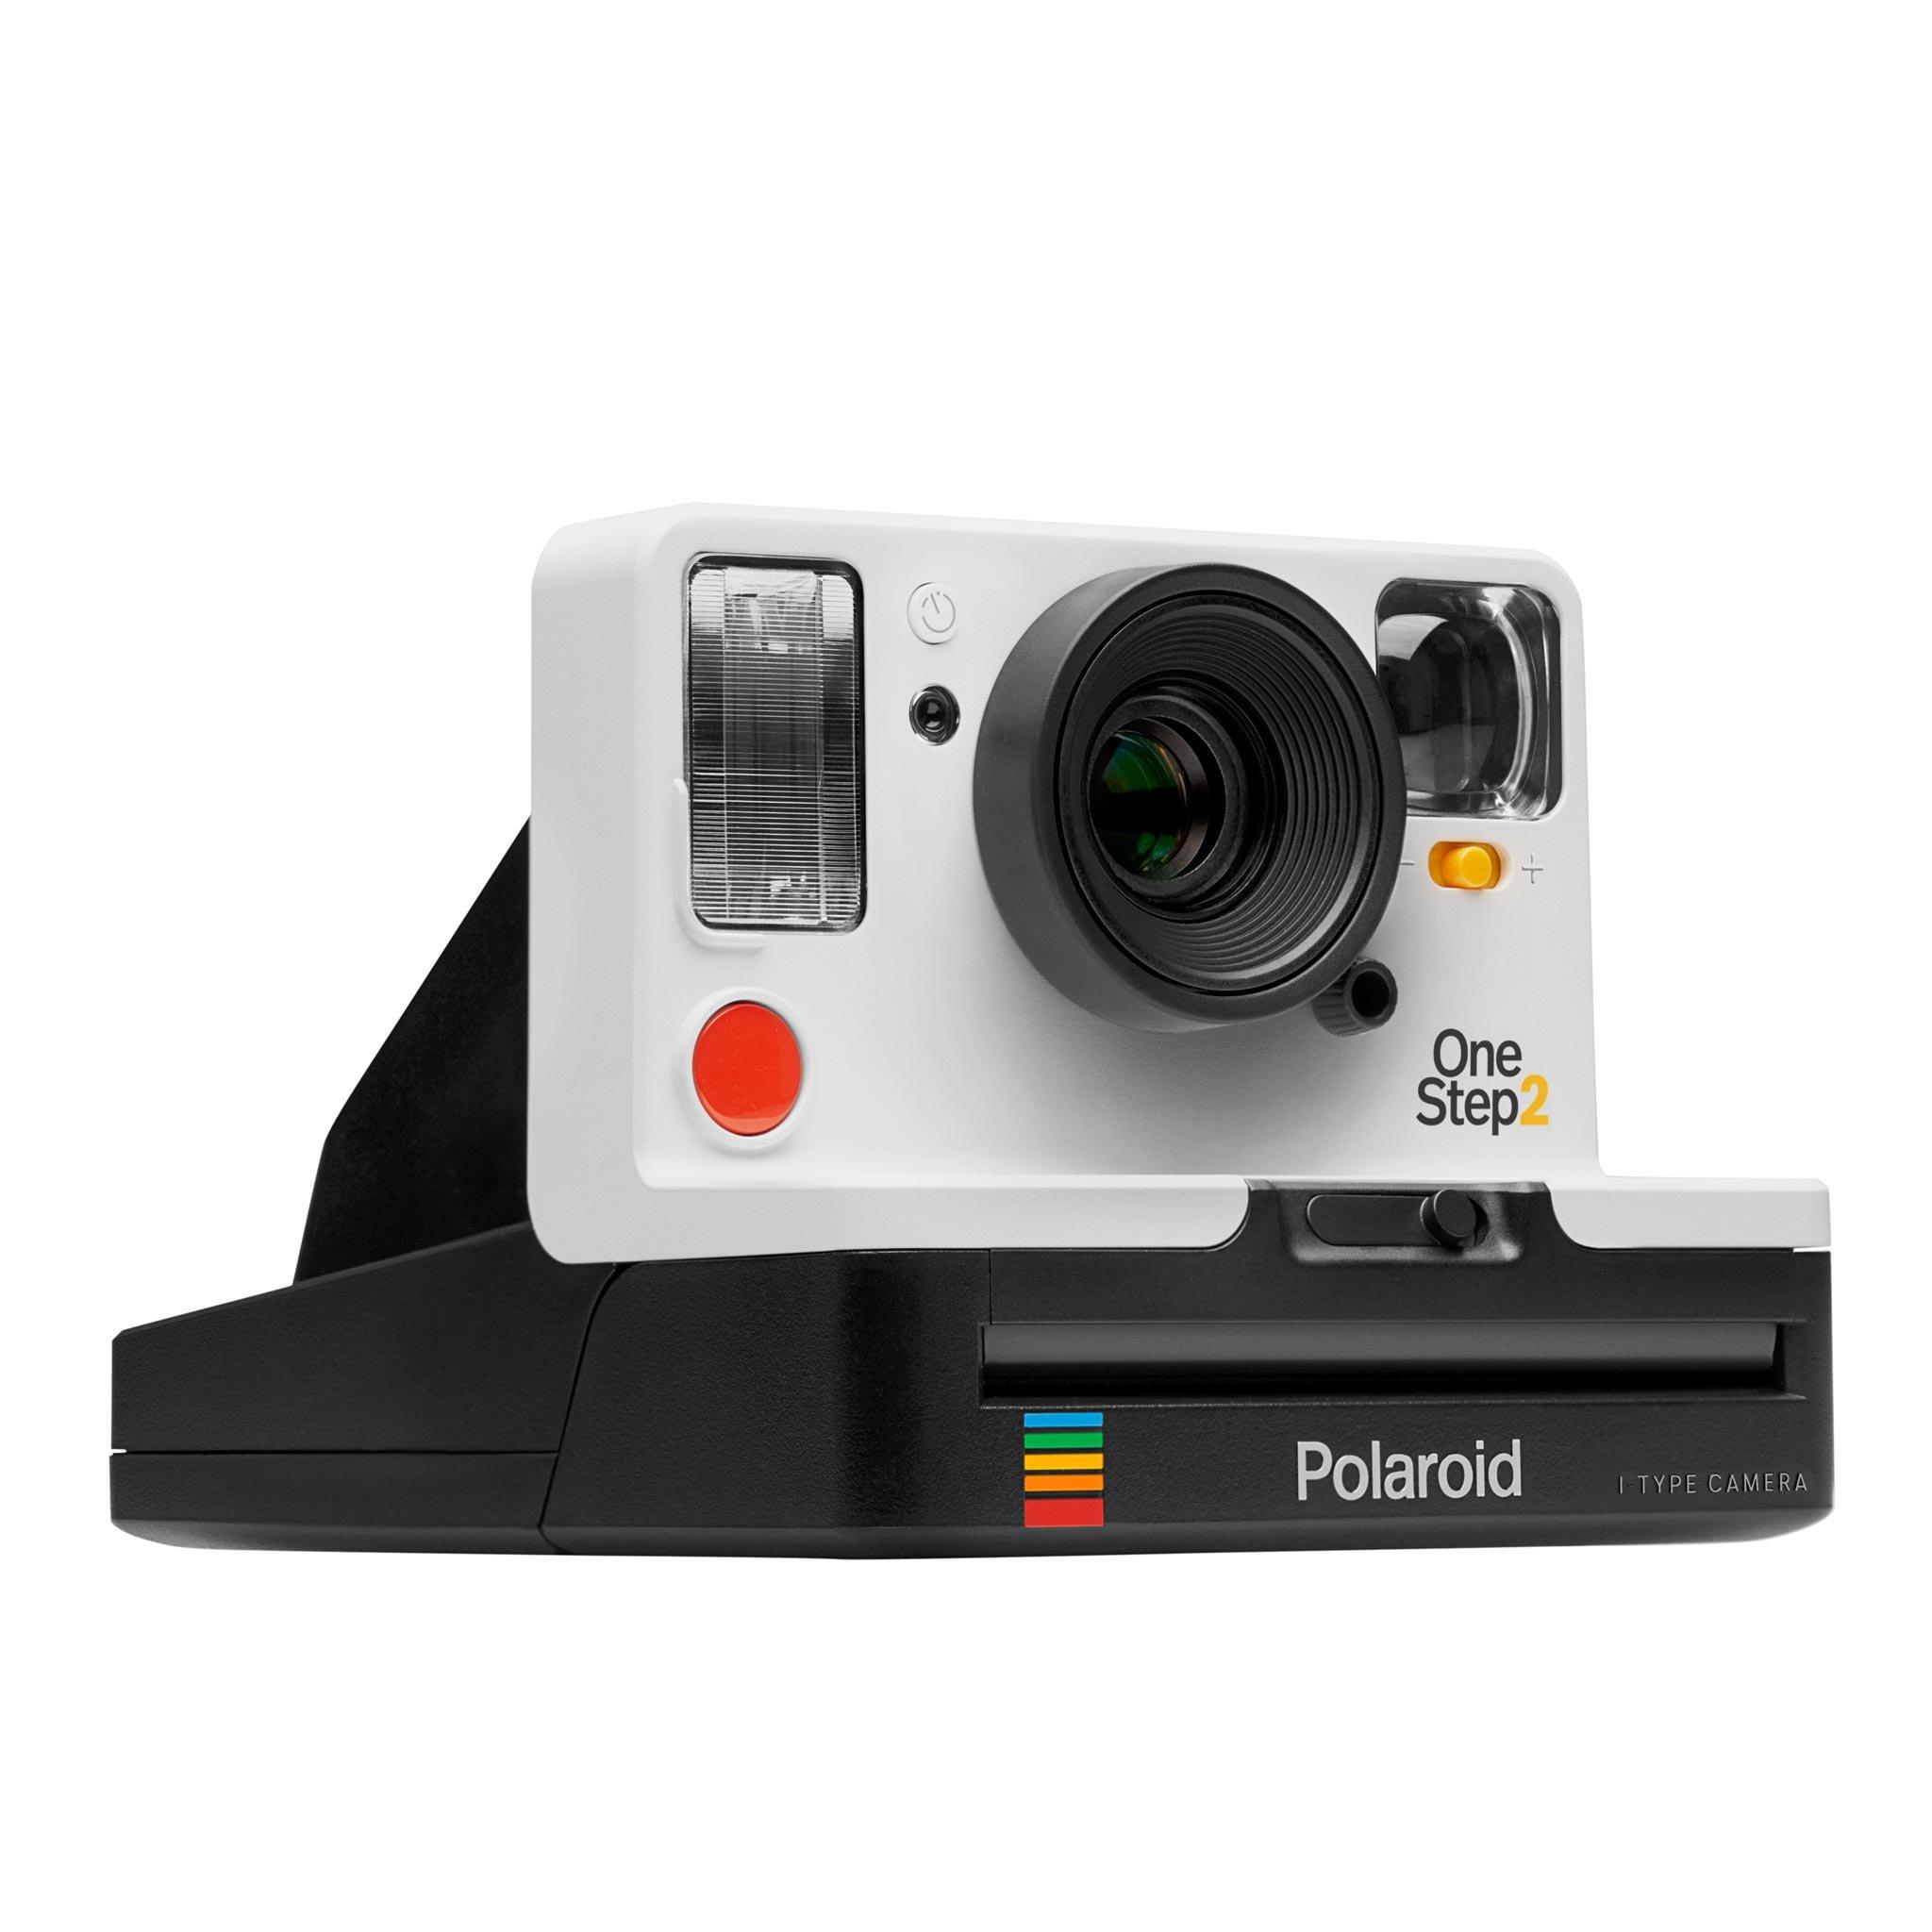 Polaroid One Step 2 Bild